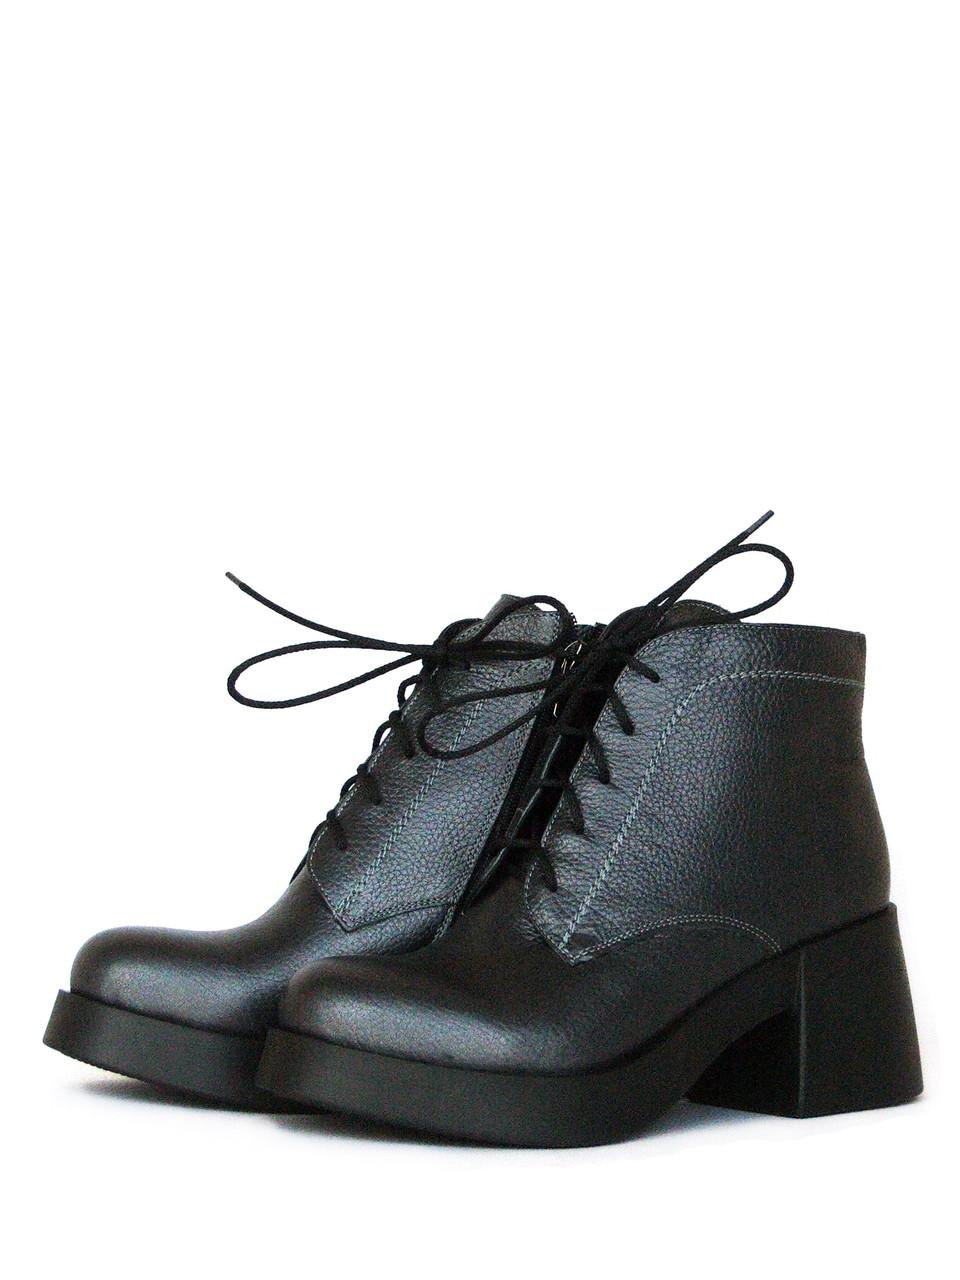 Серые ботинки на каблуке